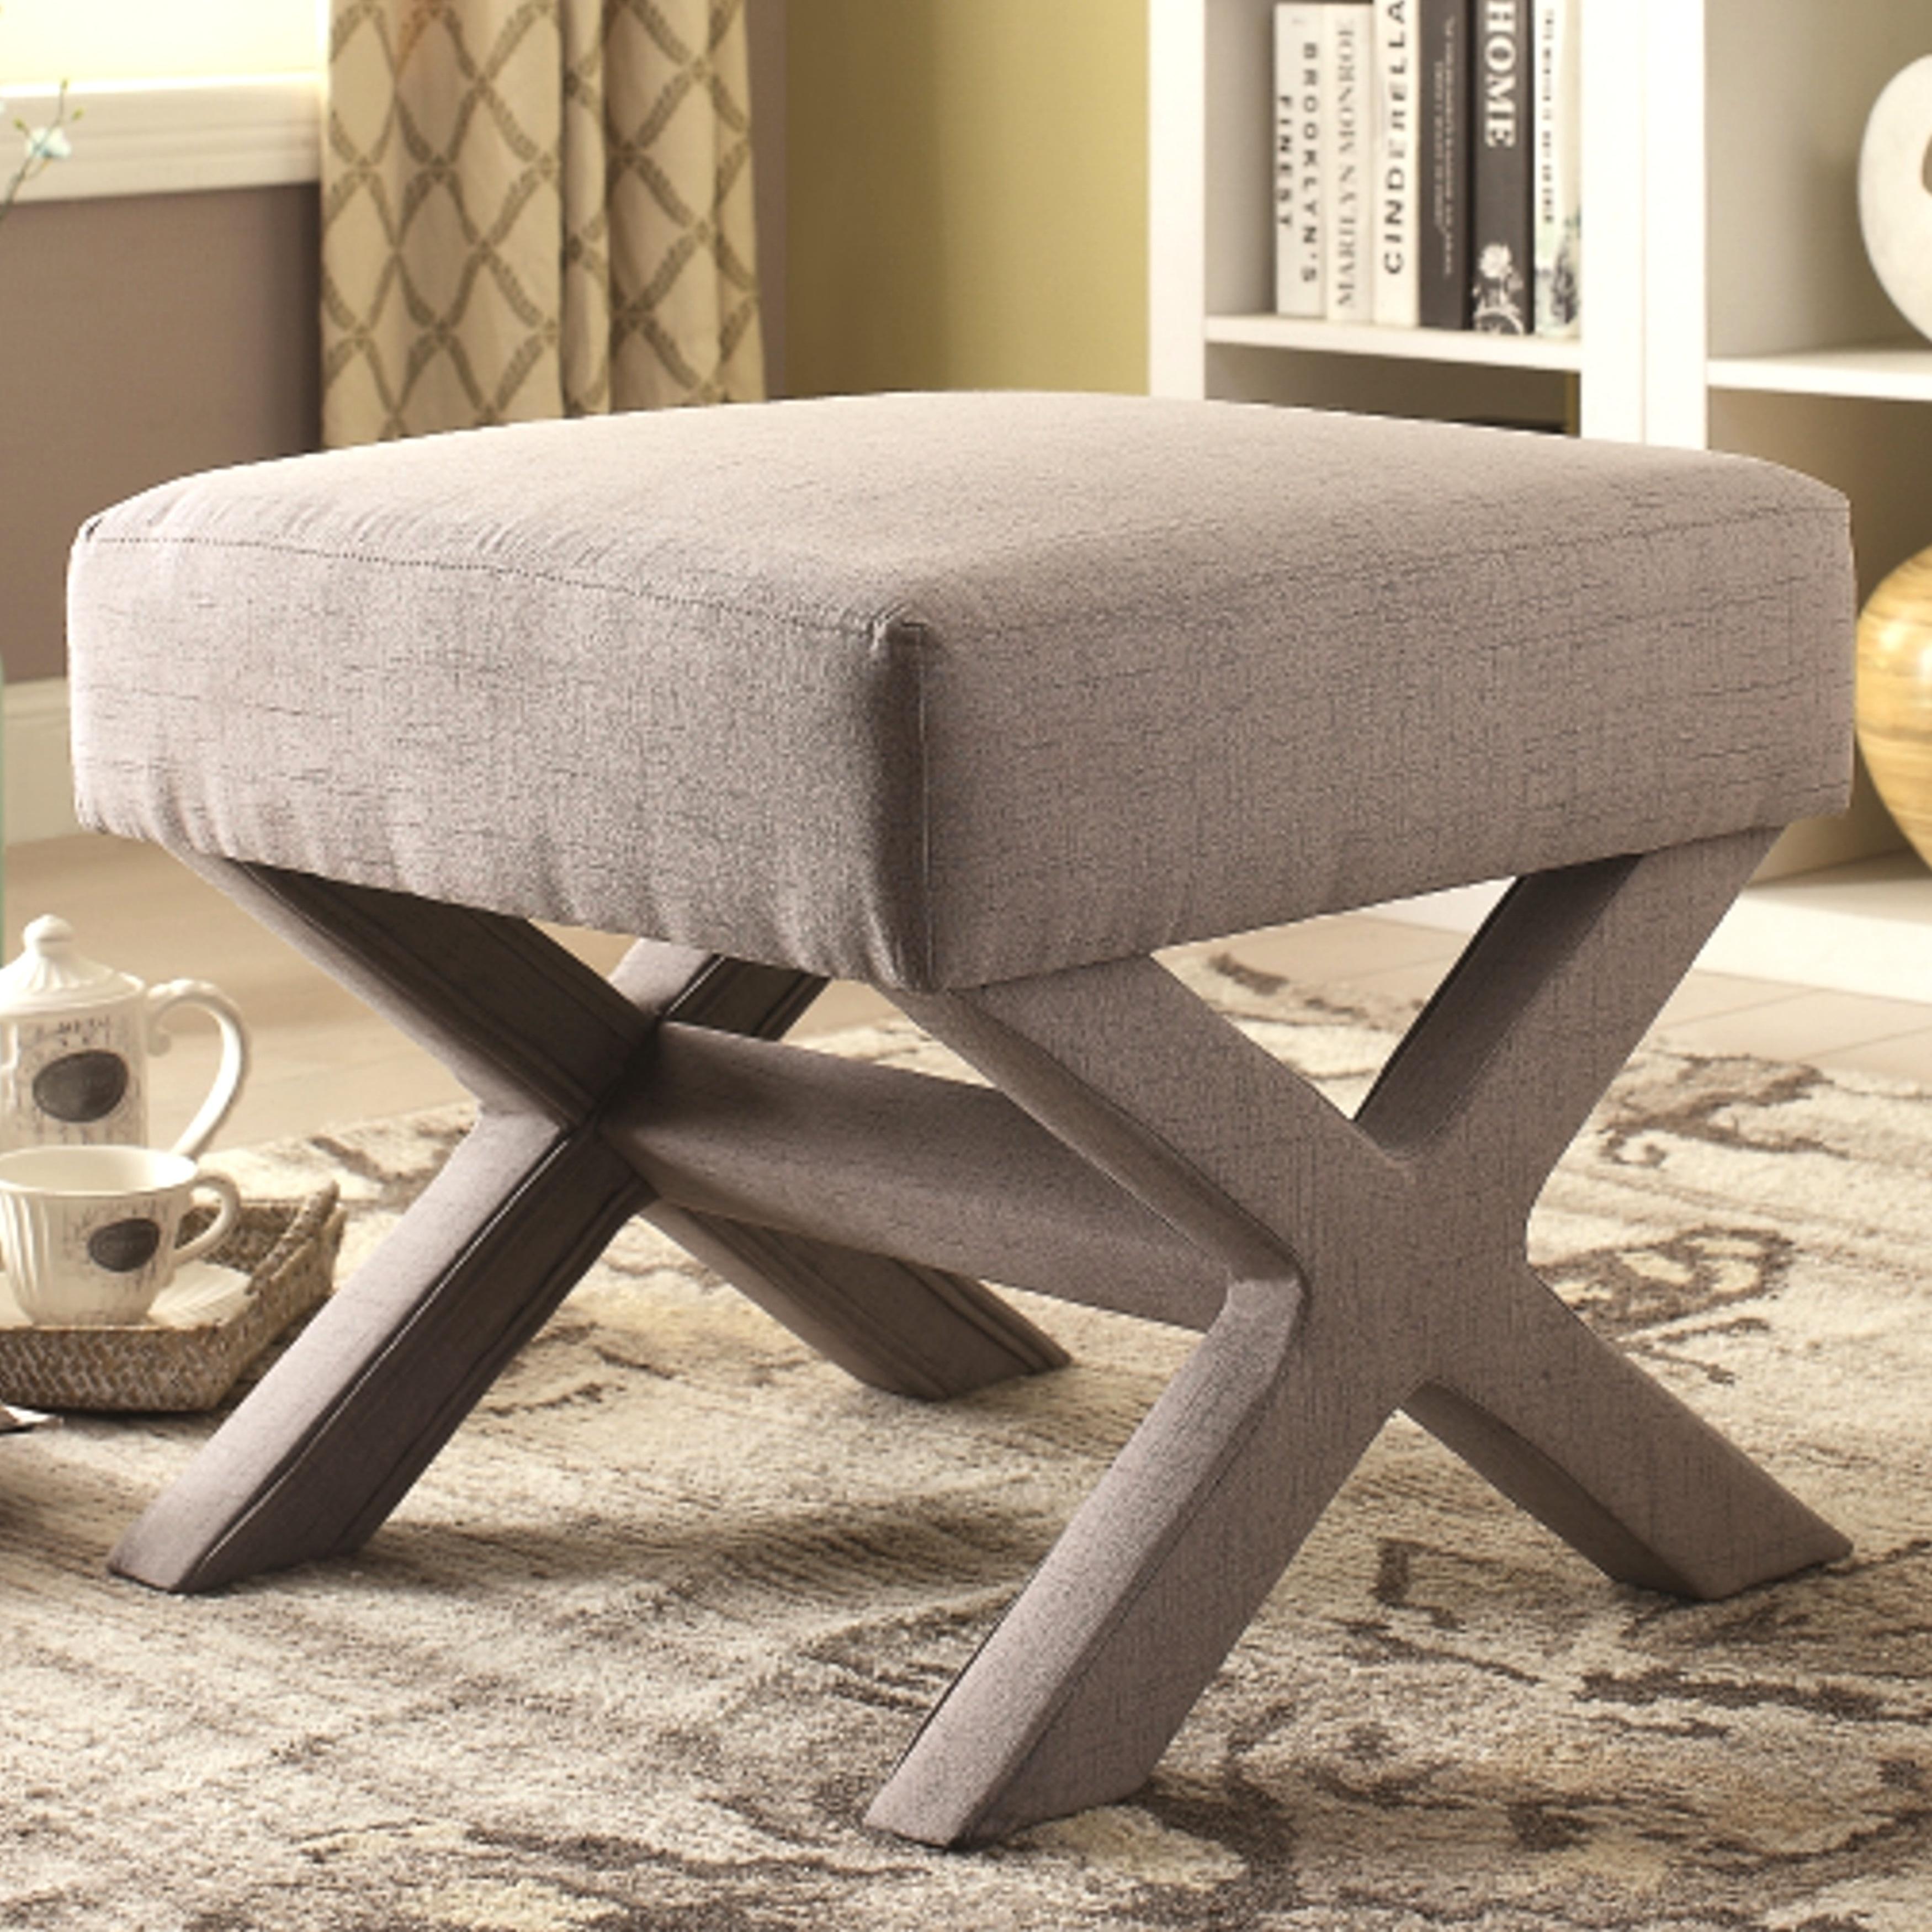 Rondo Living Room Grey Upholstered Ottoman Bench